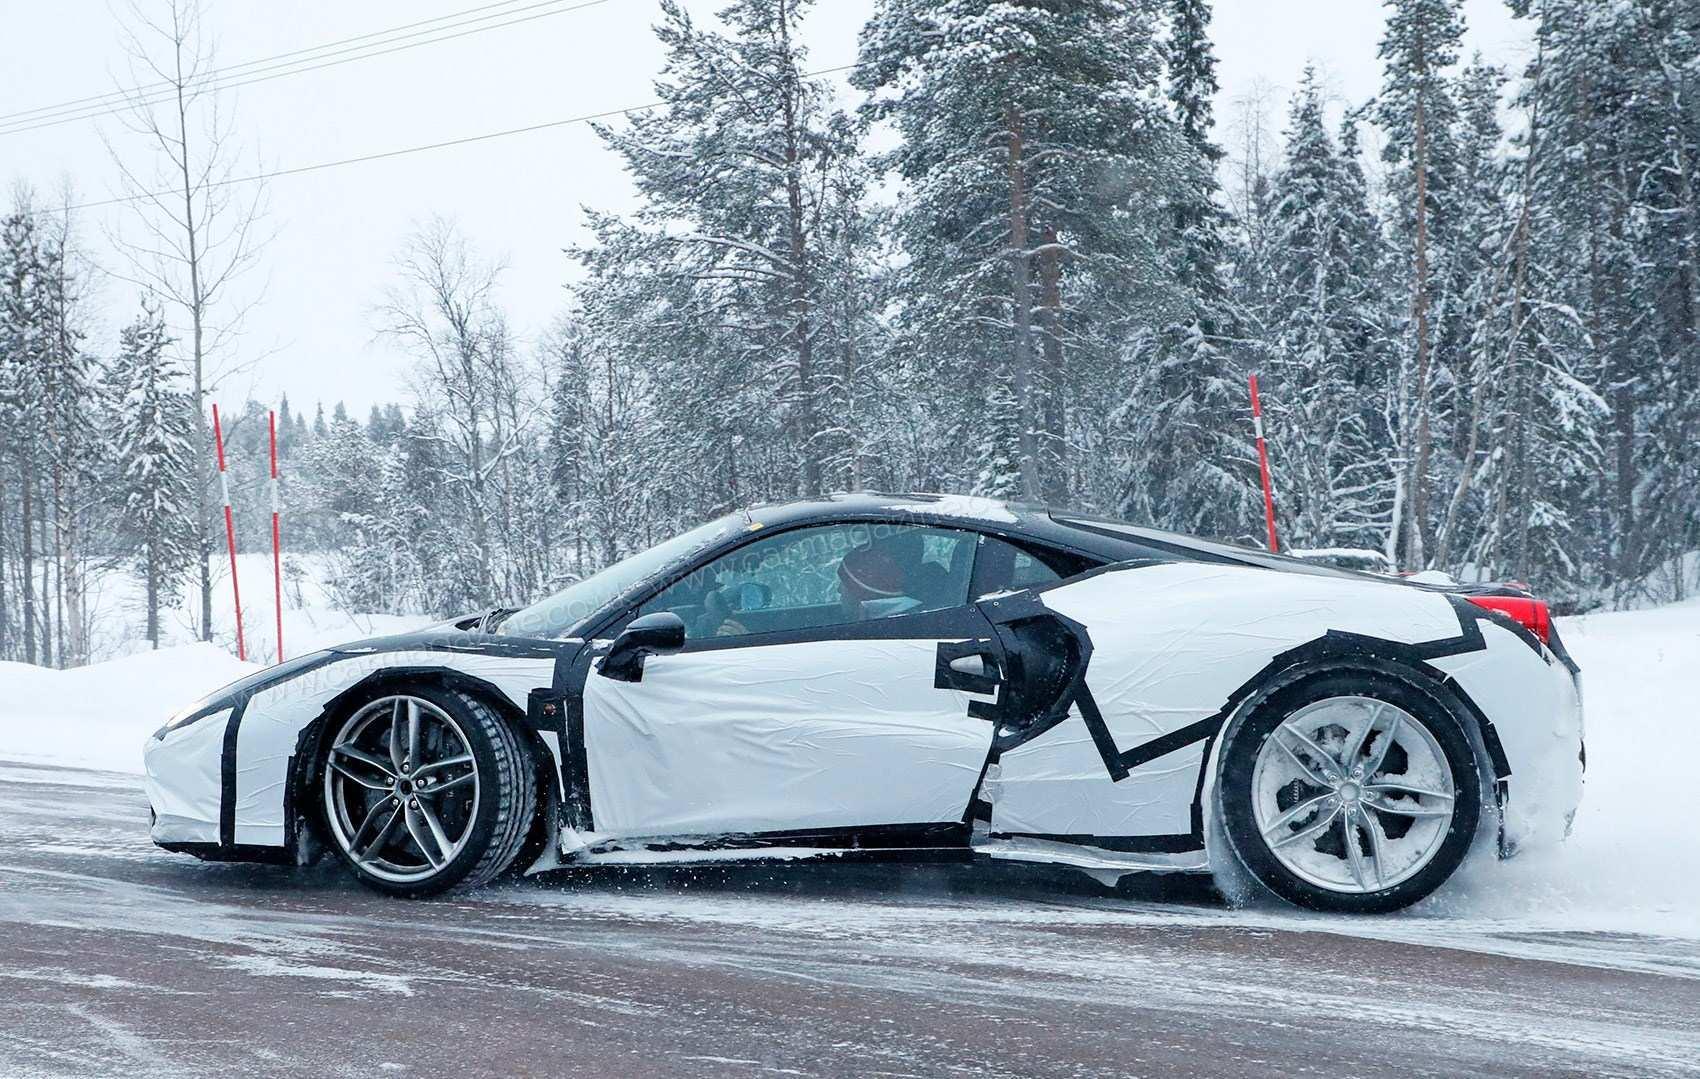 85 All New Ferrari V6 2019 History with Ferrari V6 2019